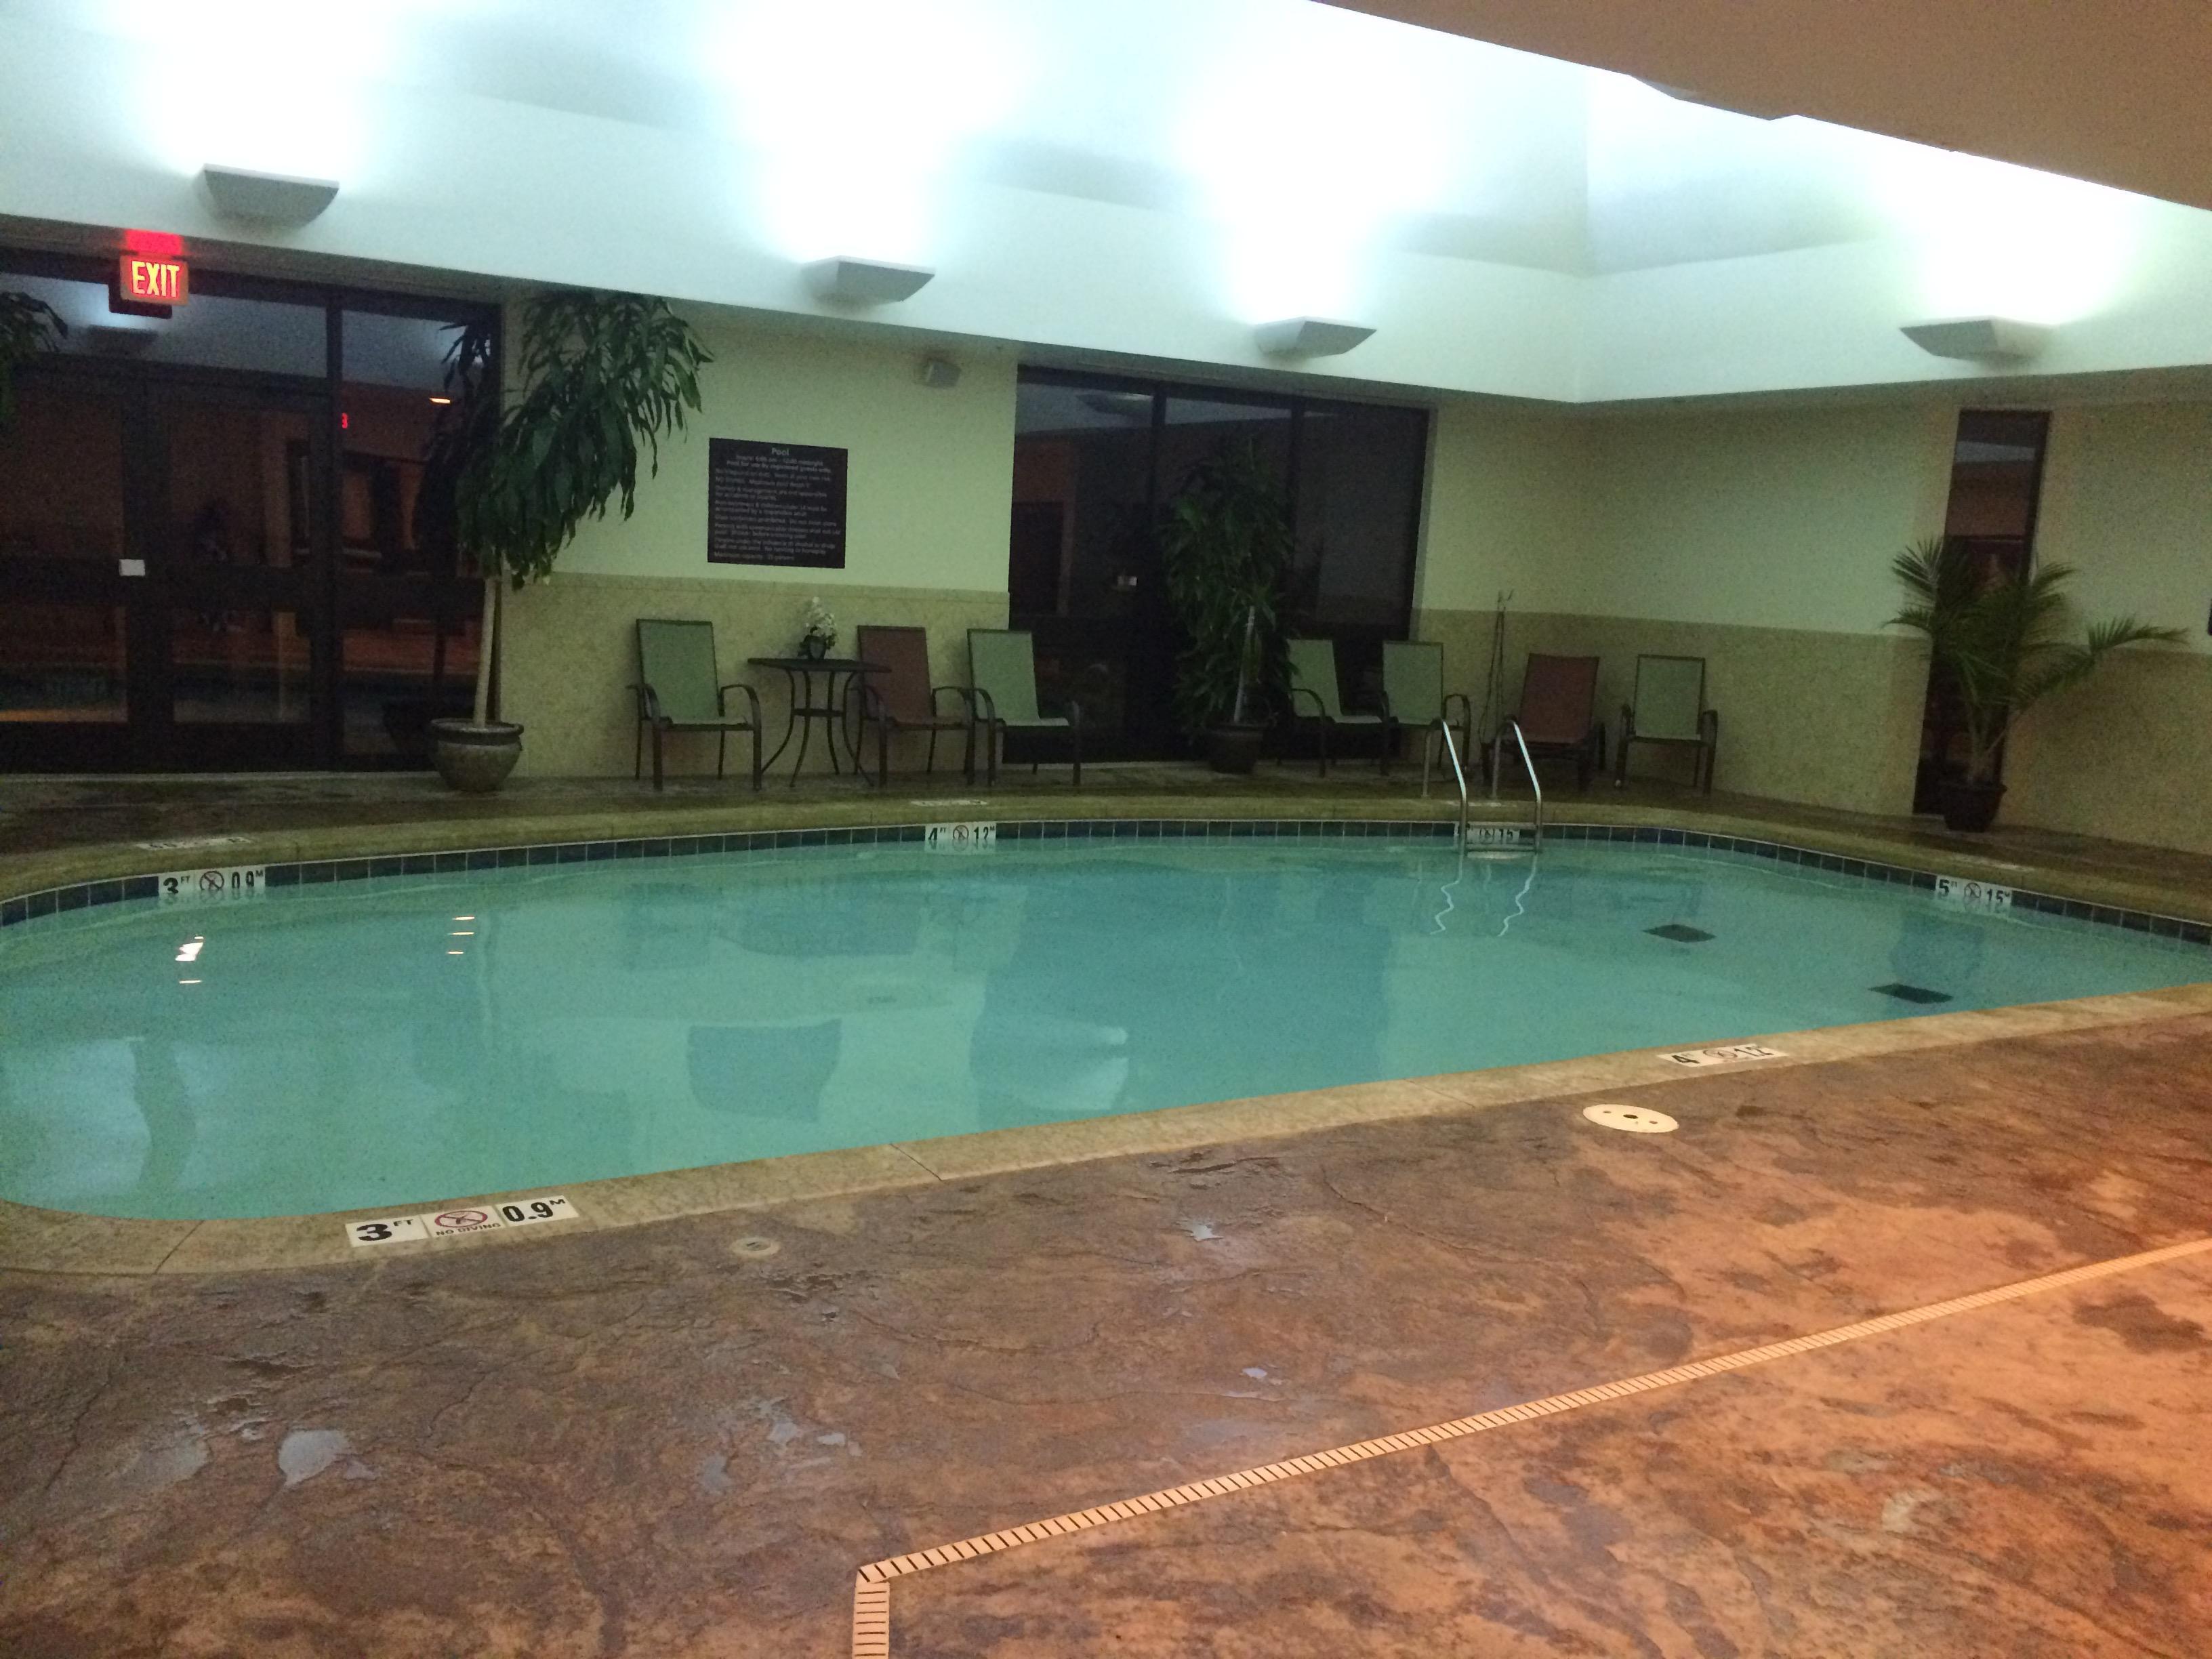 Hot tub closed July 20, 2016